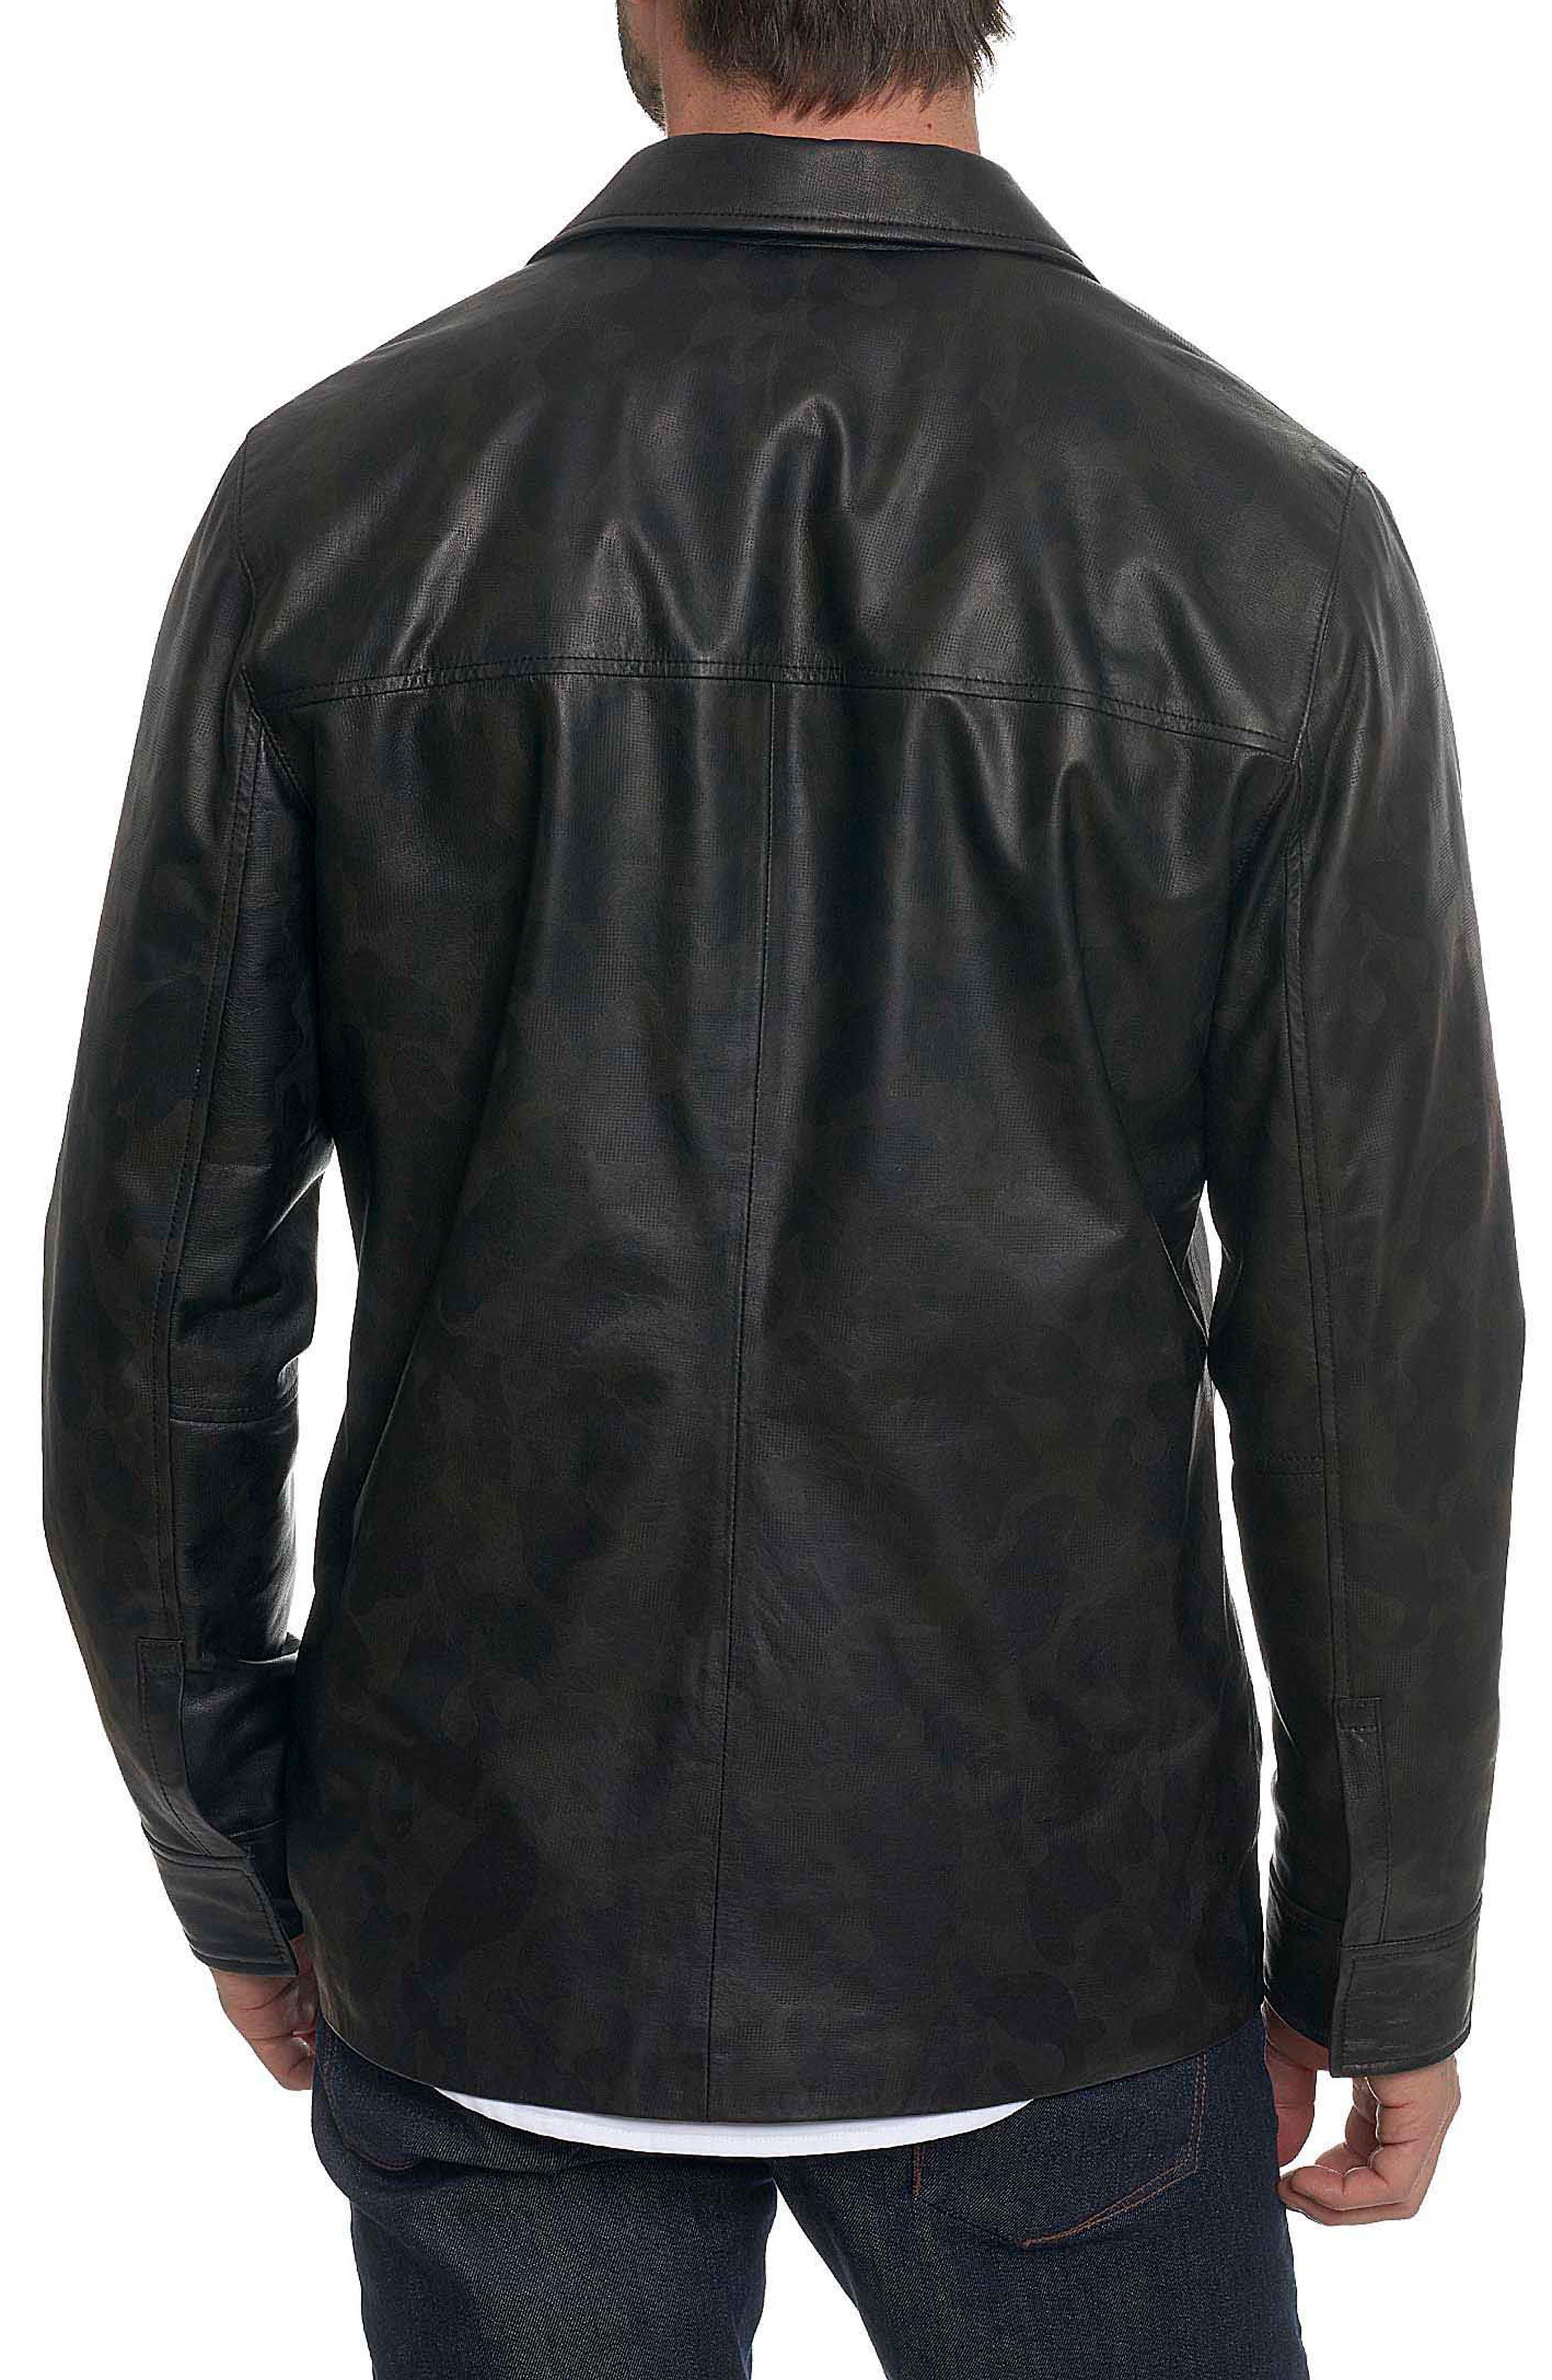 Colden Camo Leather Shirt Jacket,                             Alternate thumbnail 2, color,                             001